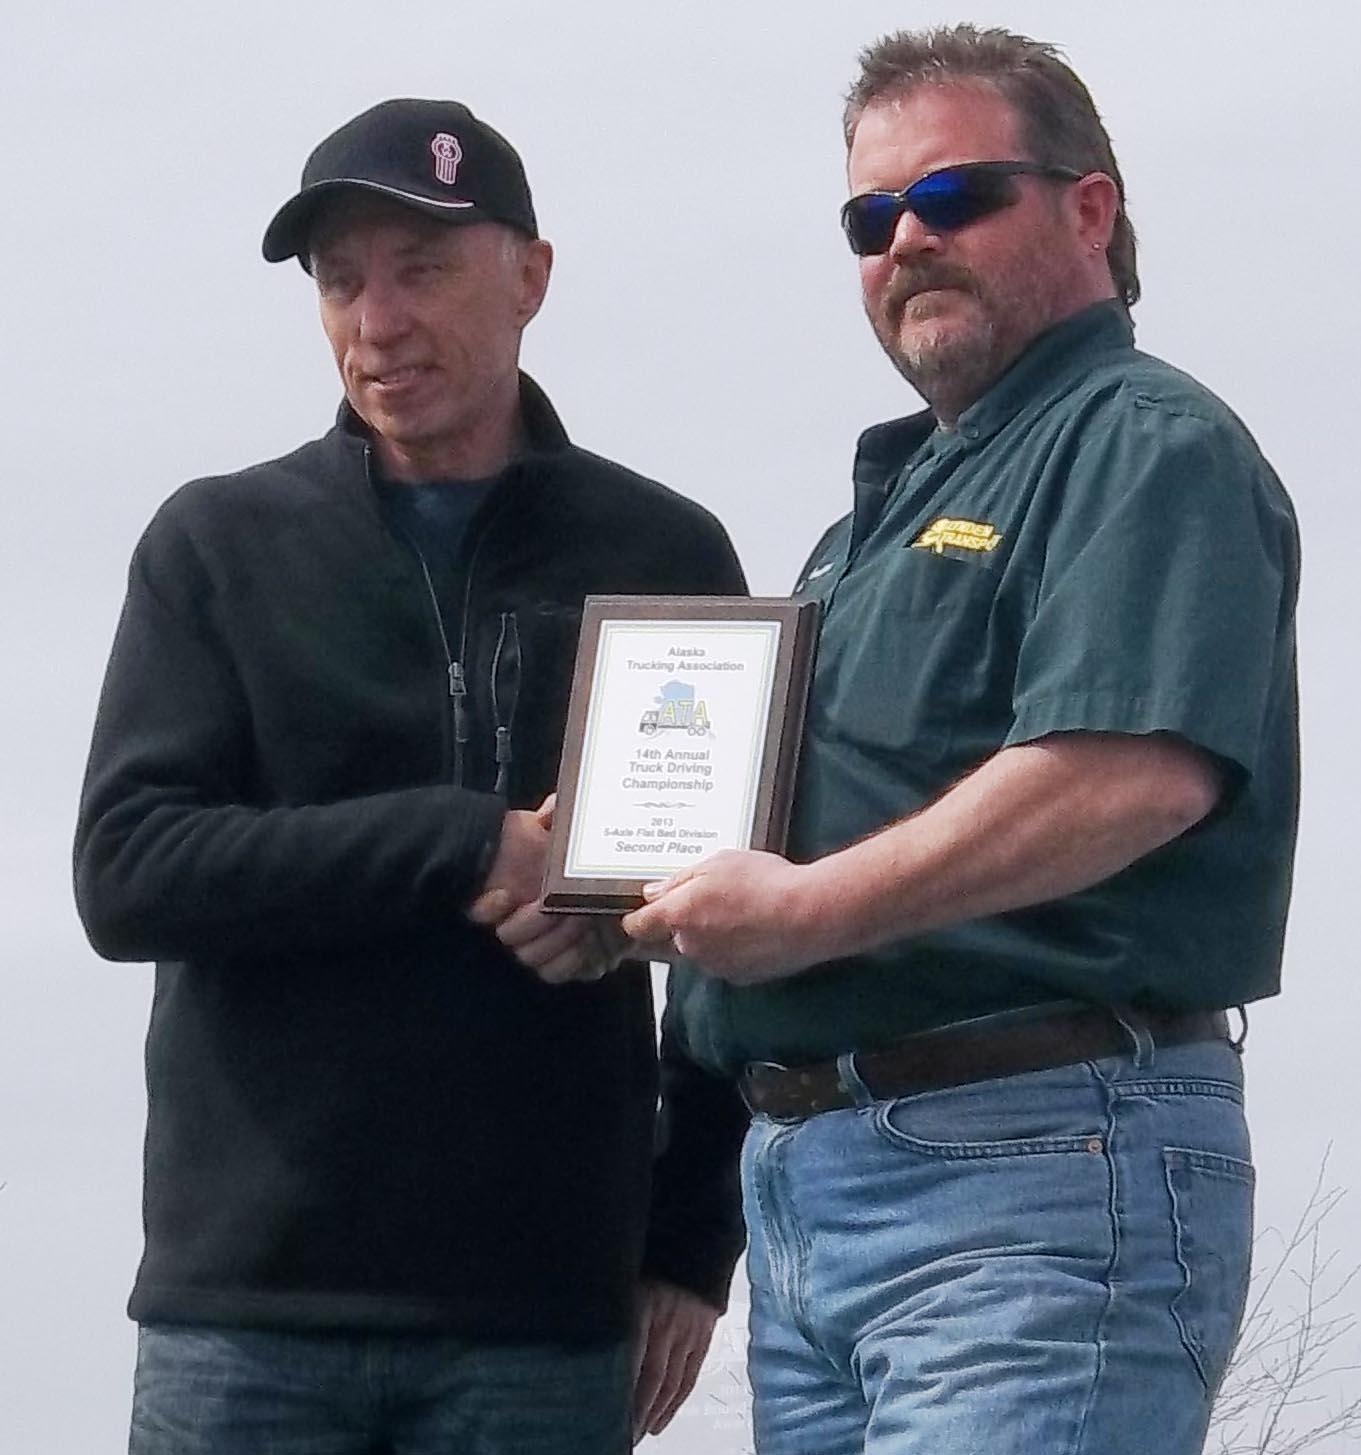 Tom Martin   2013 Truck Driving Championships